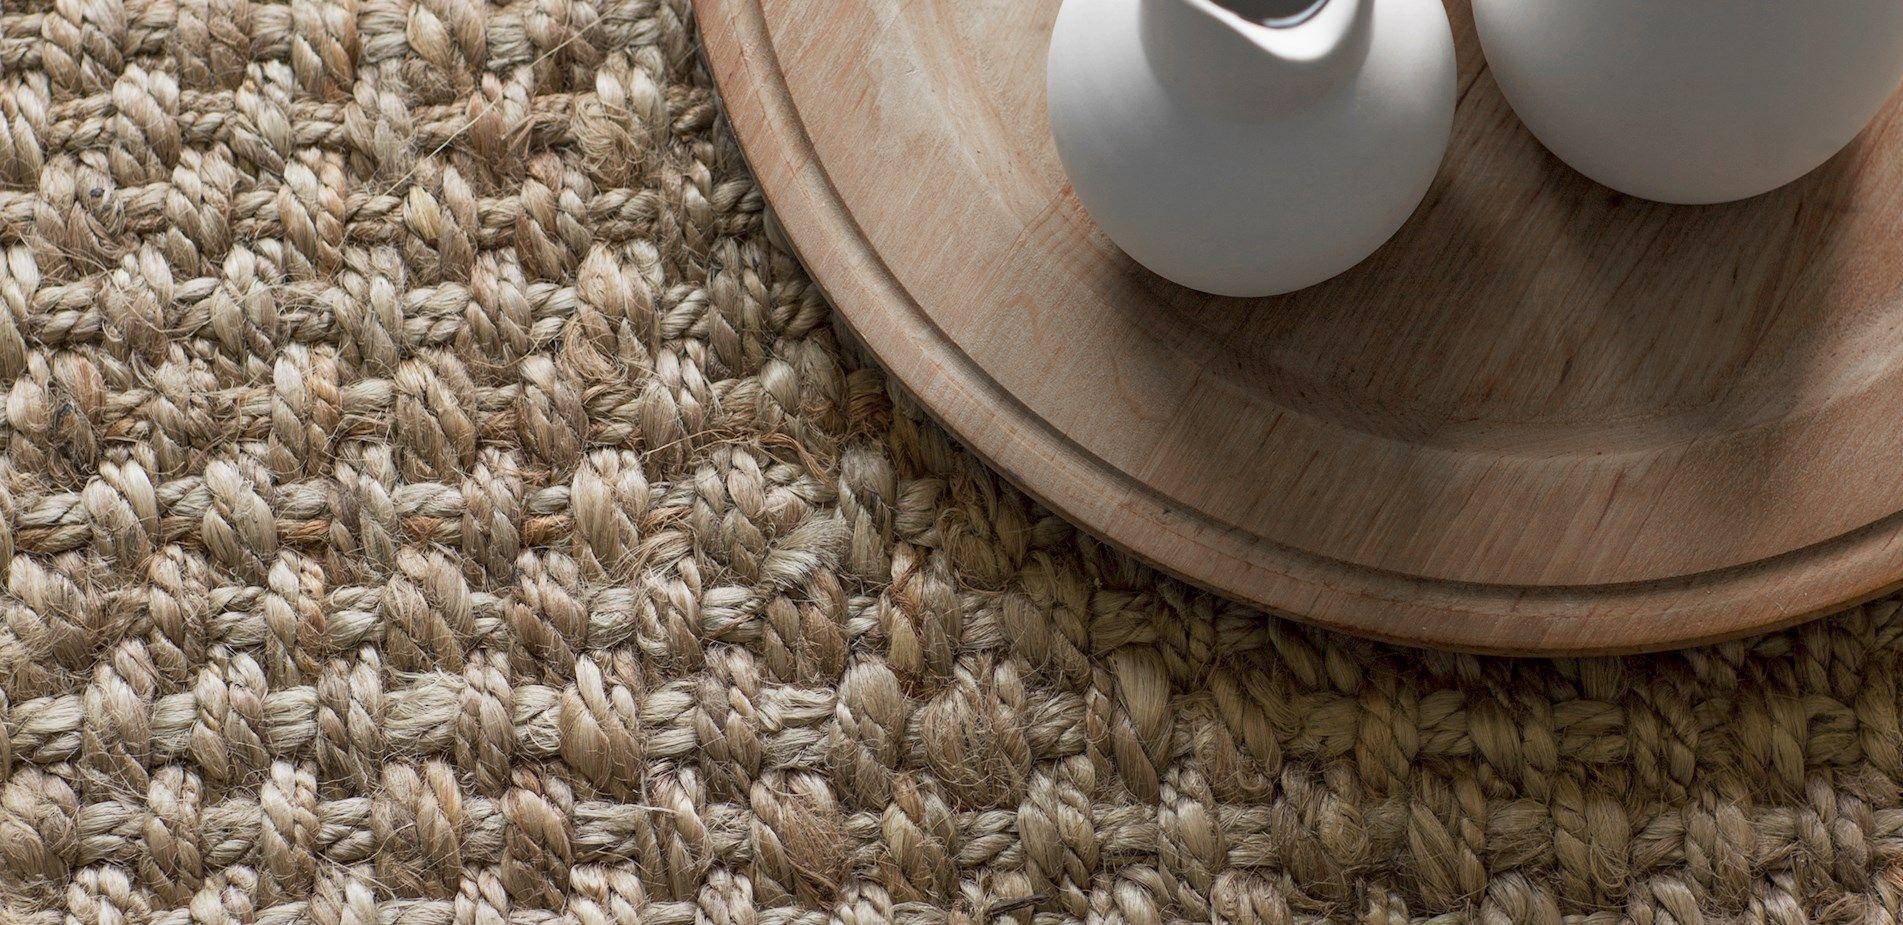 Jute Flooring   Wall To Wall Jute Carpet  Naked Flooring